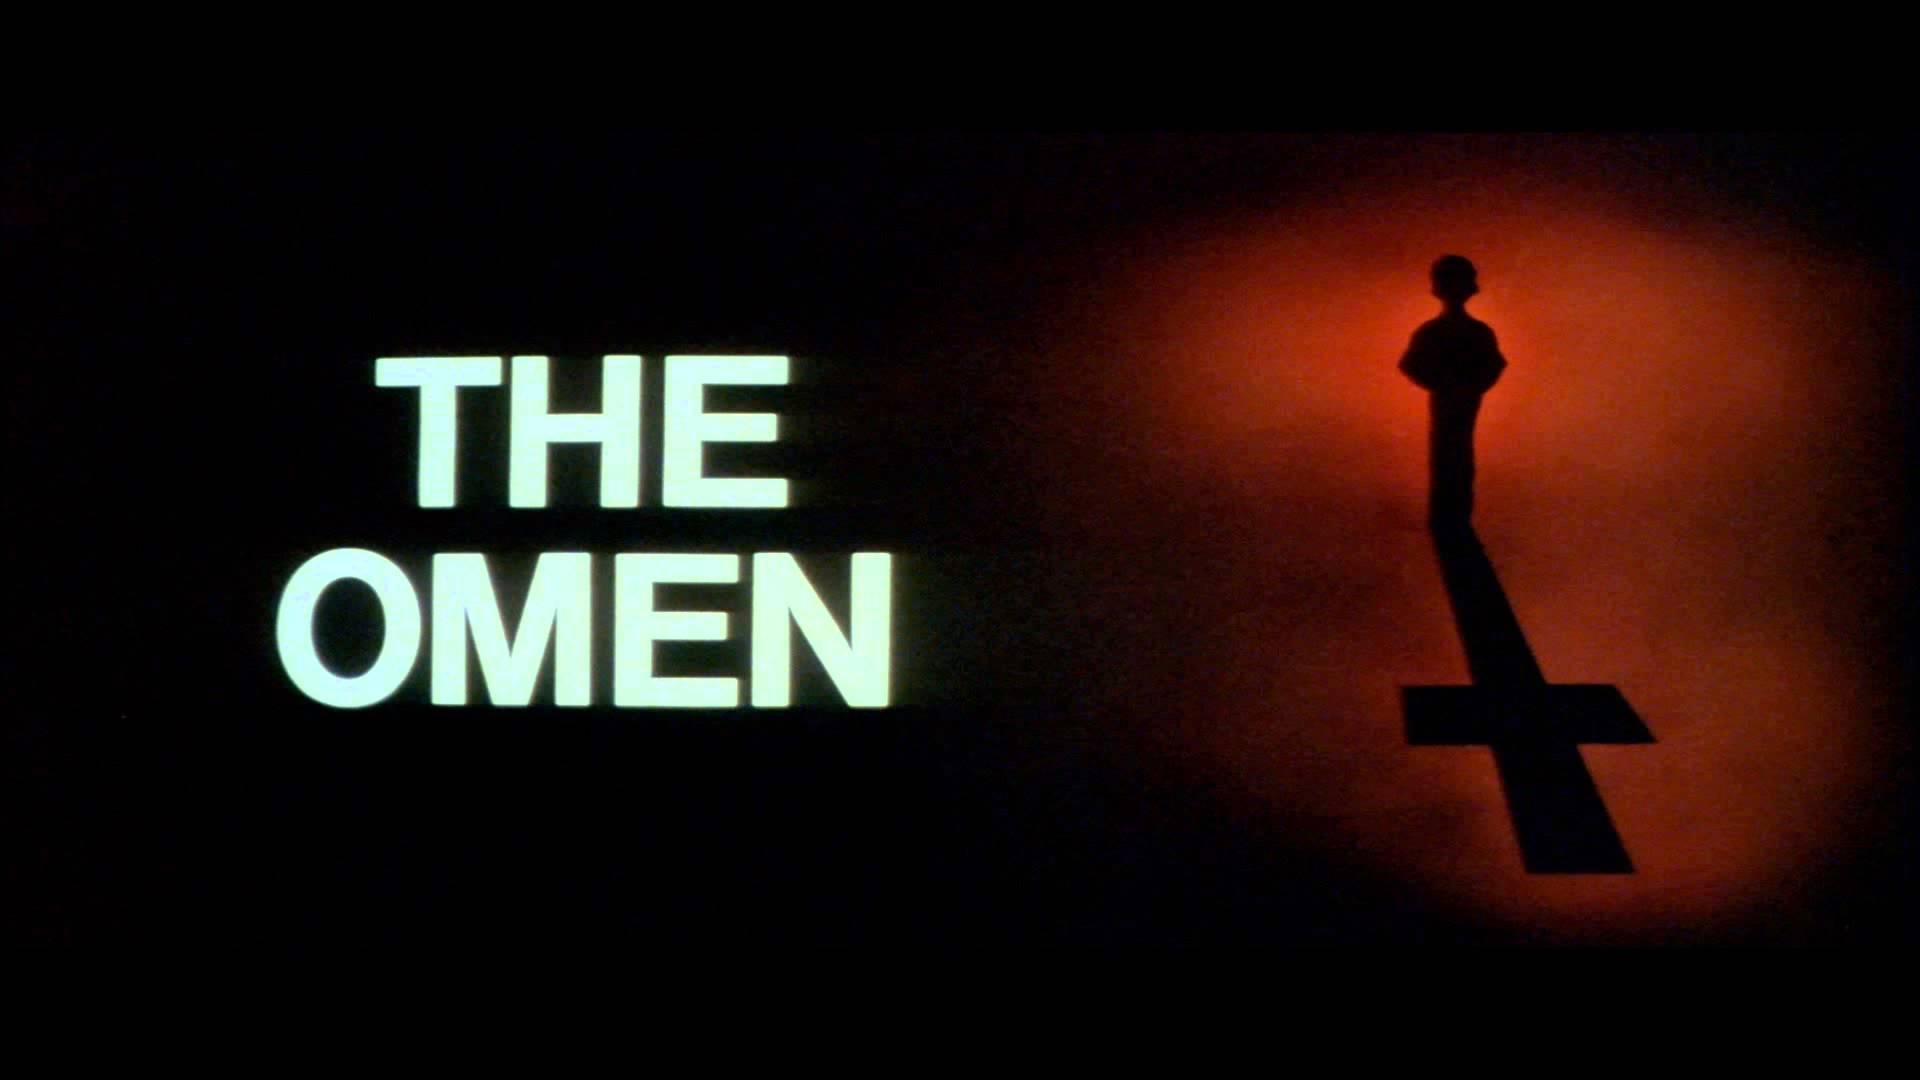 La Profecía (The Omen), Filme de 1976 – Soundtrack